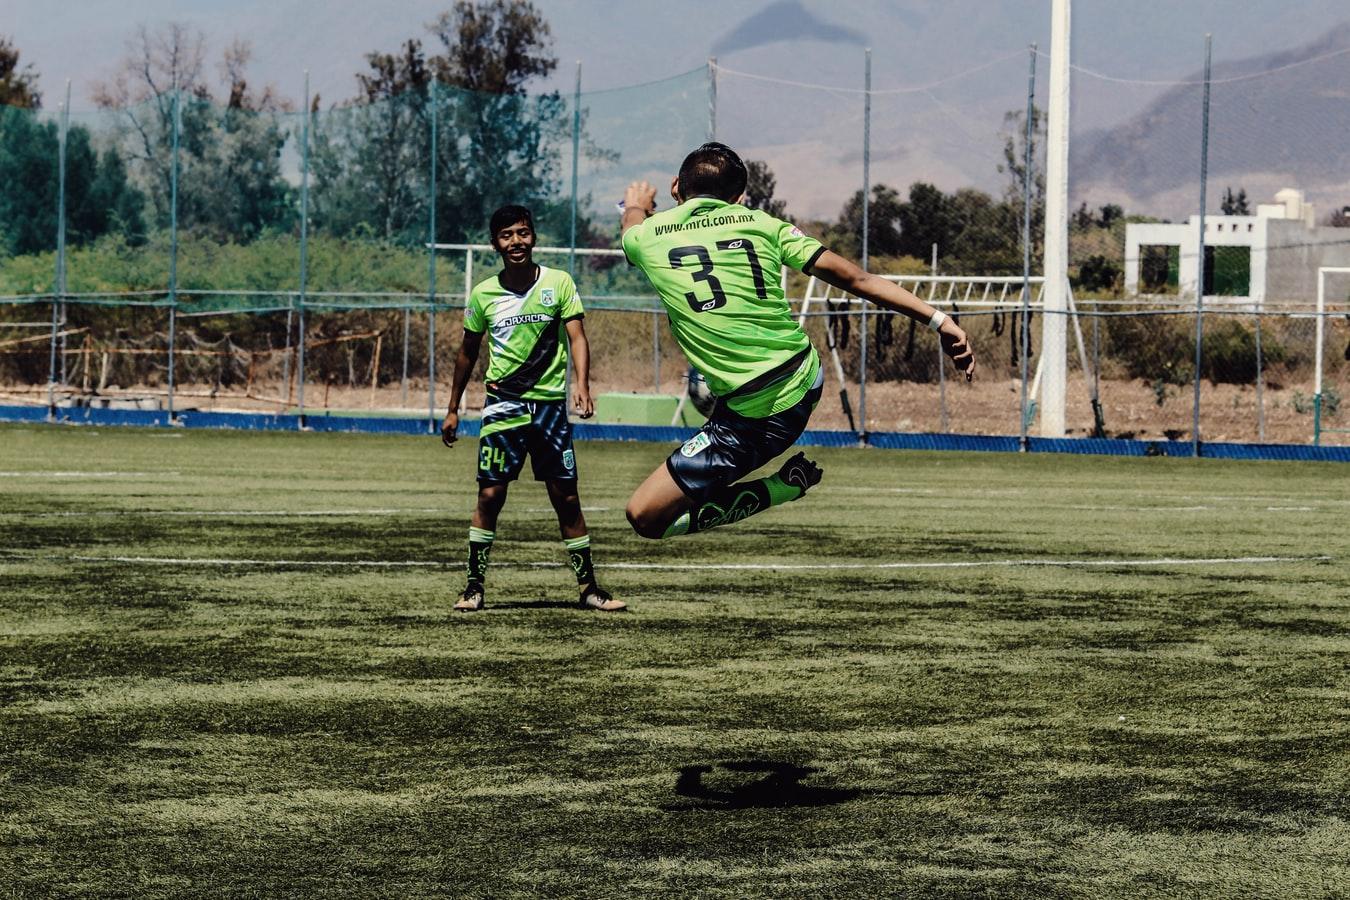 Bagaimana Cara Memilih Bandar Bola Modern